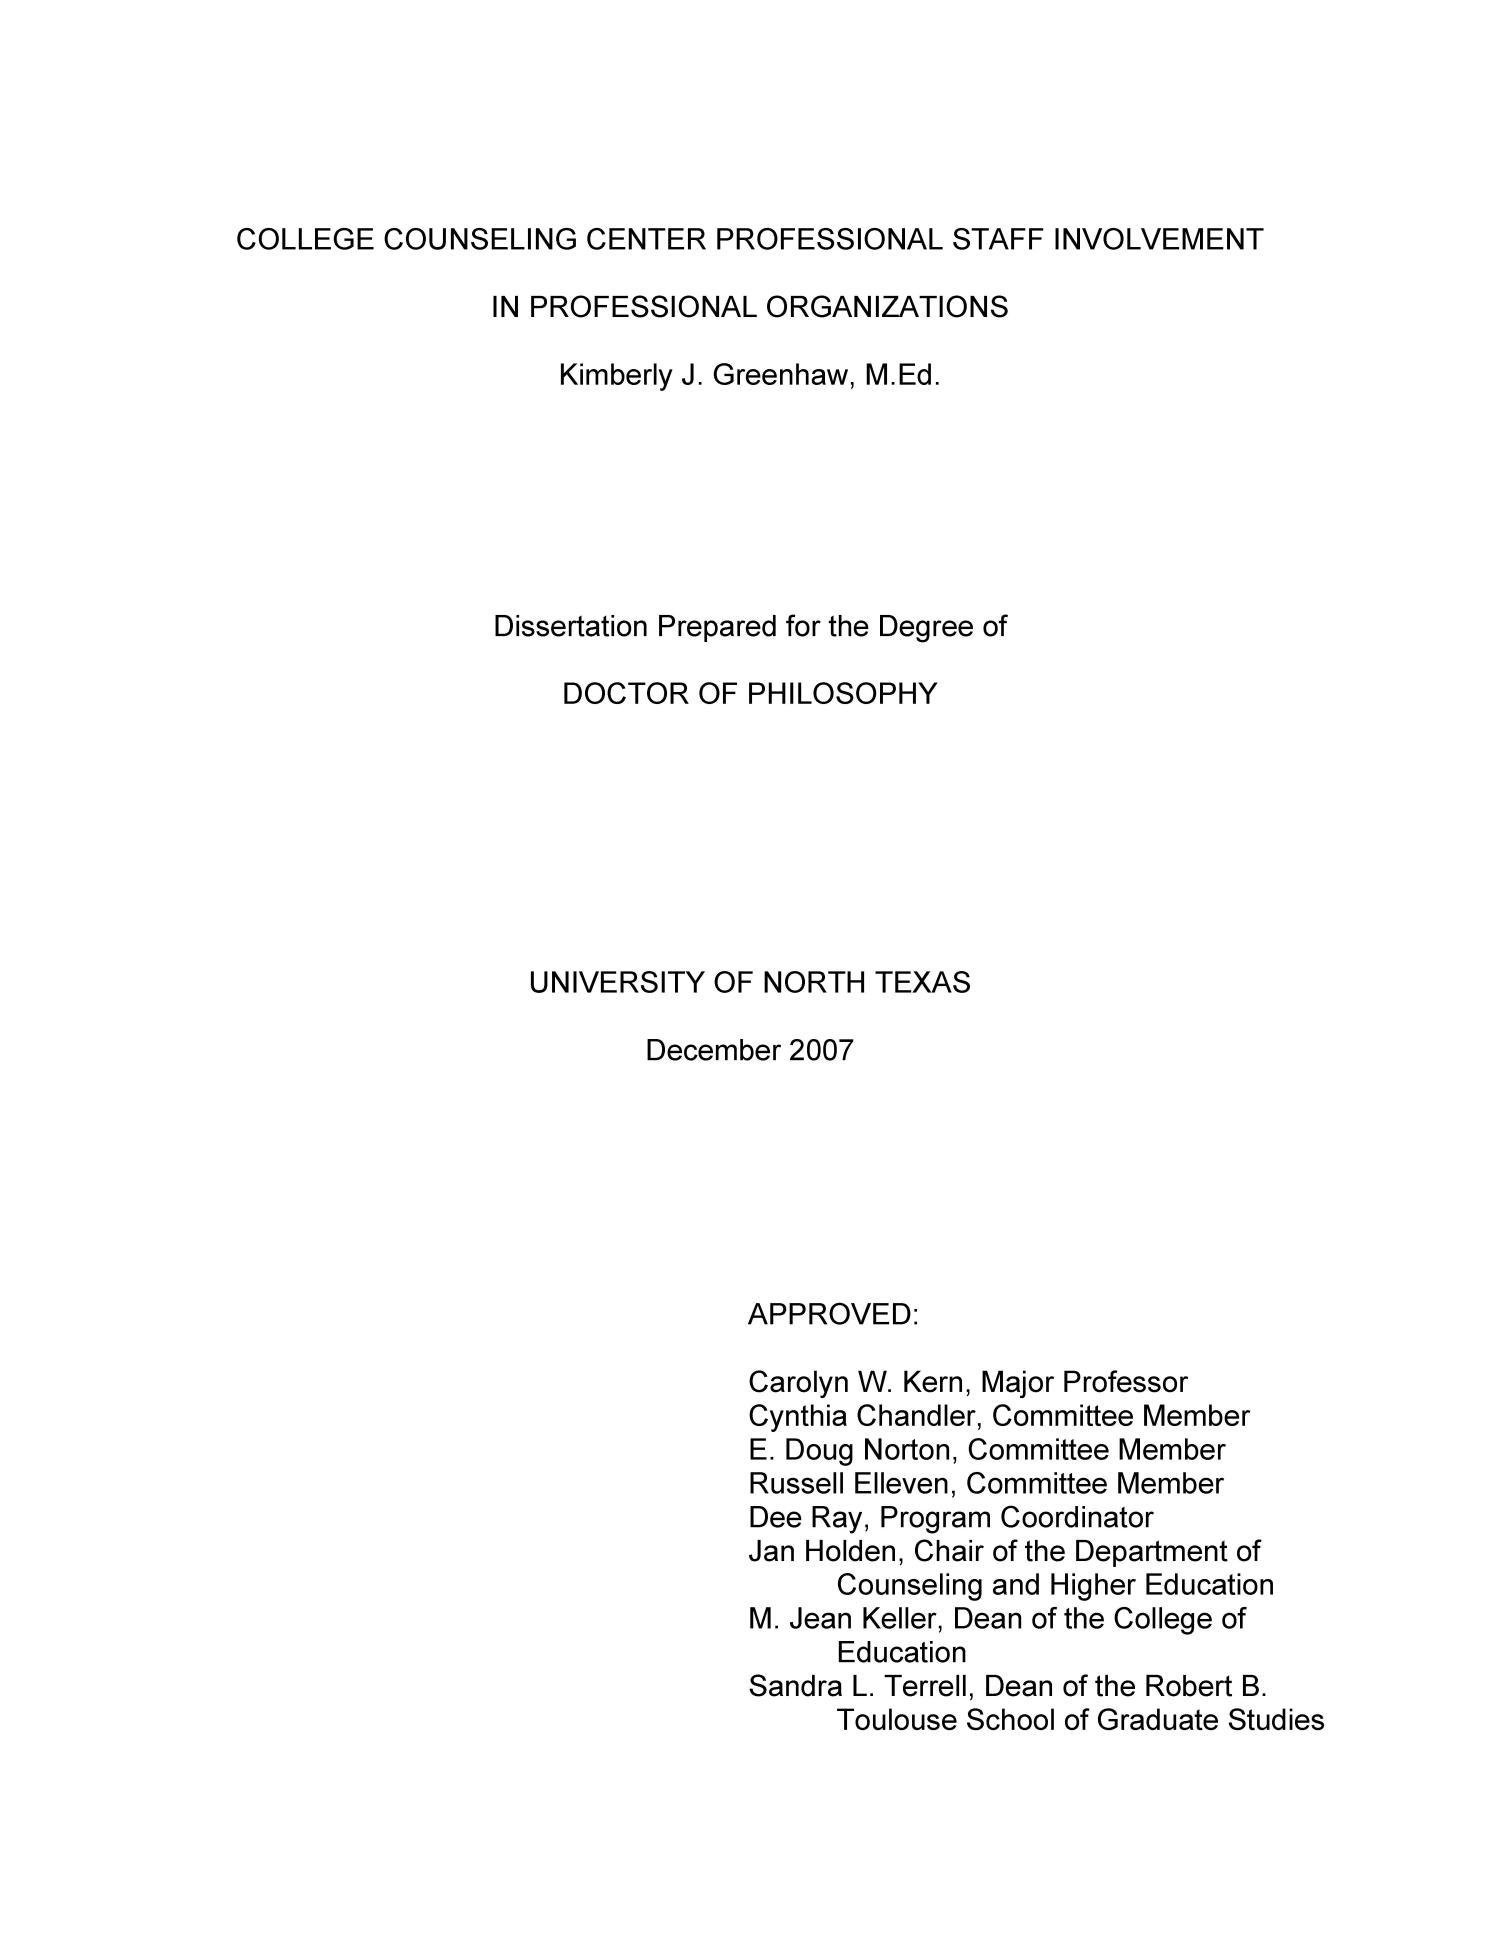 Cold war truman doctrine essay